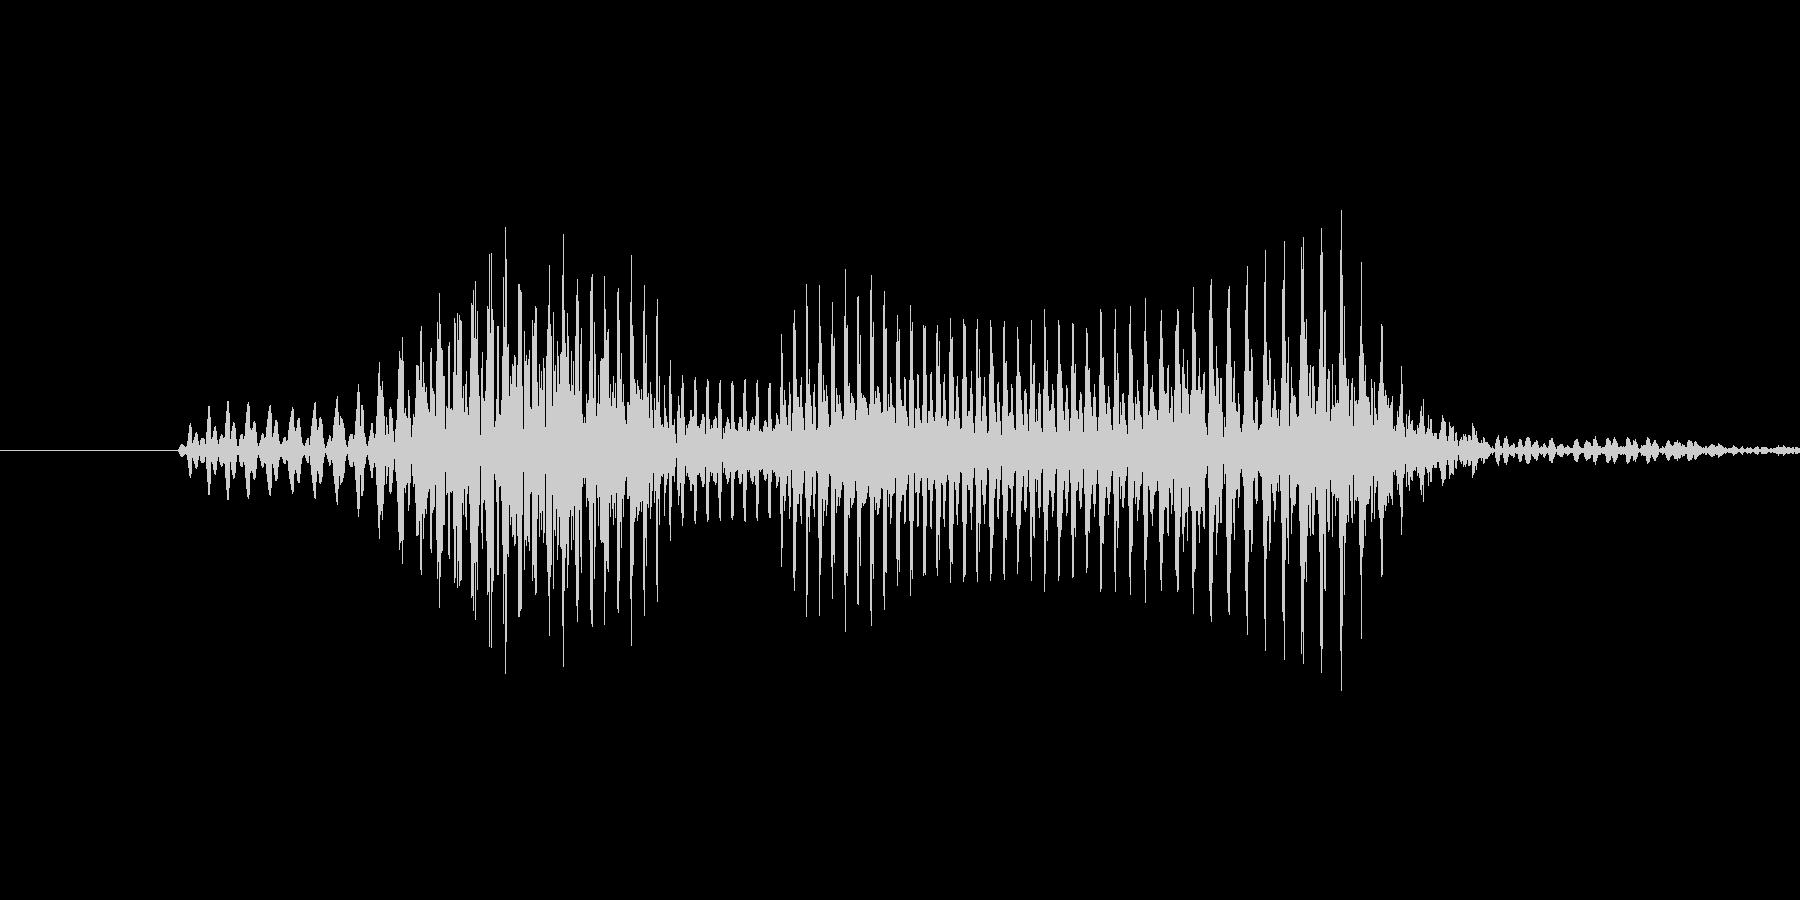 「1 AM」英語発音の未再生の波形